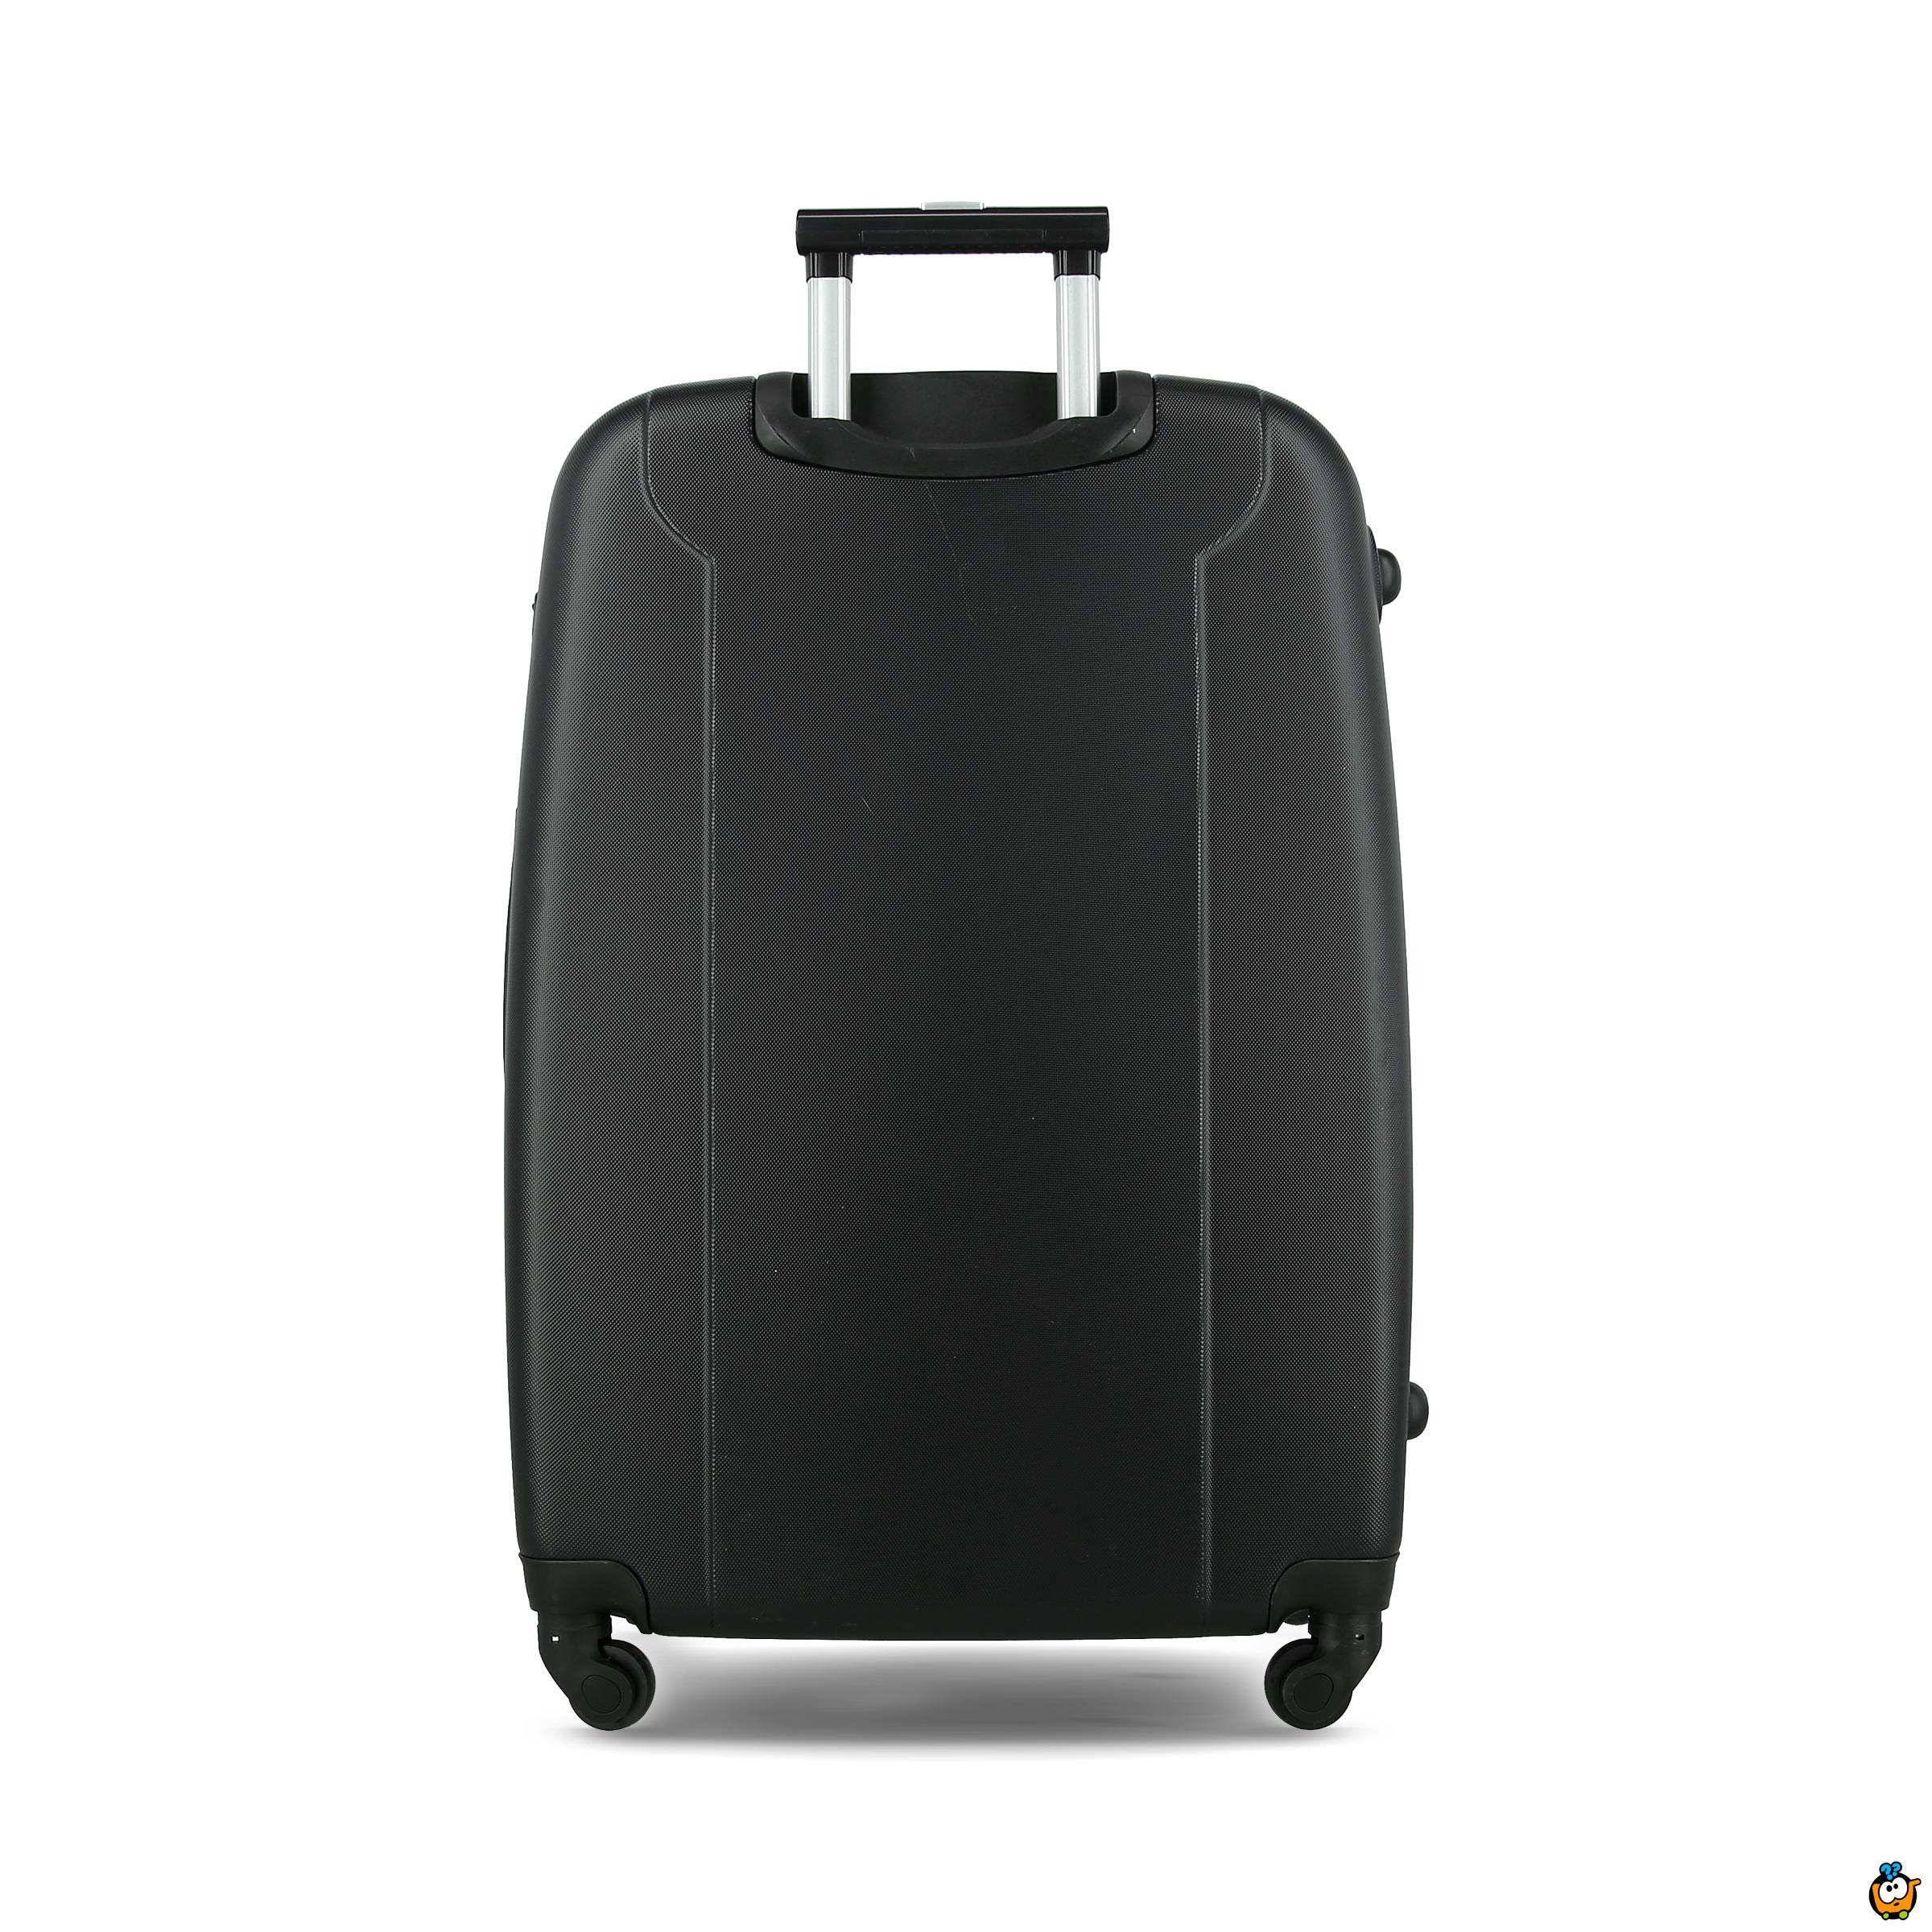 Putni kofer Expandable sa točkićima 360° -  CRNI L